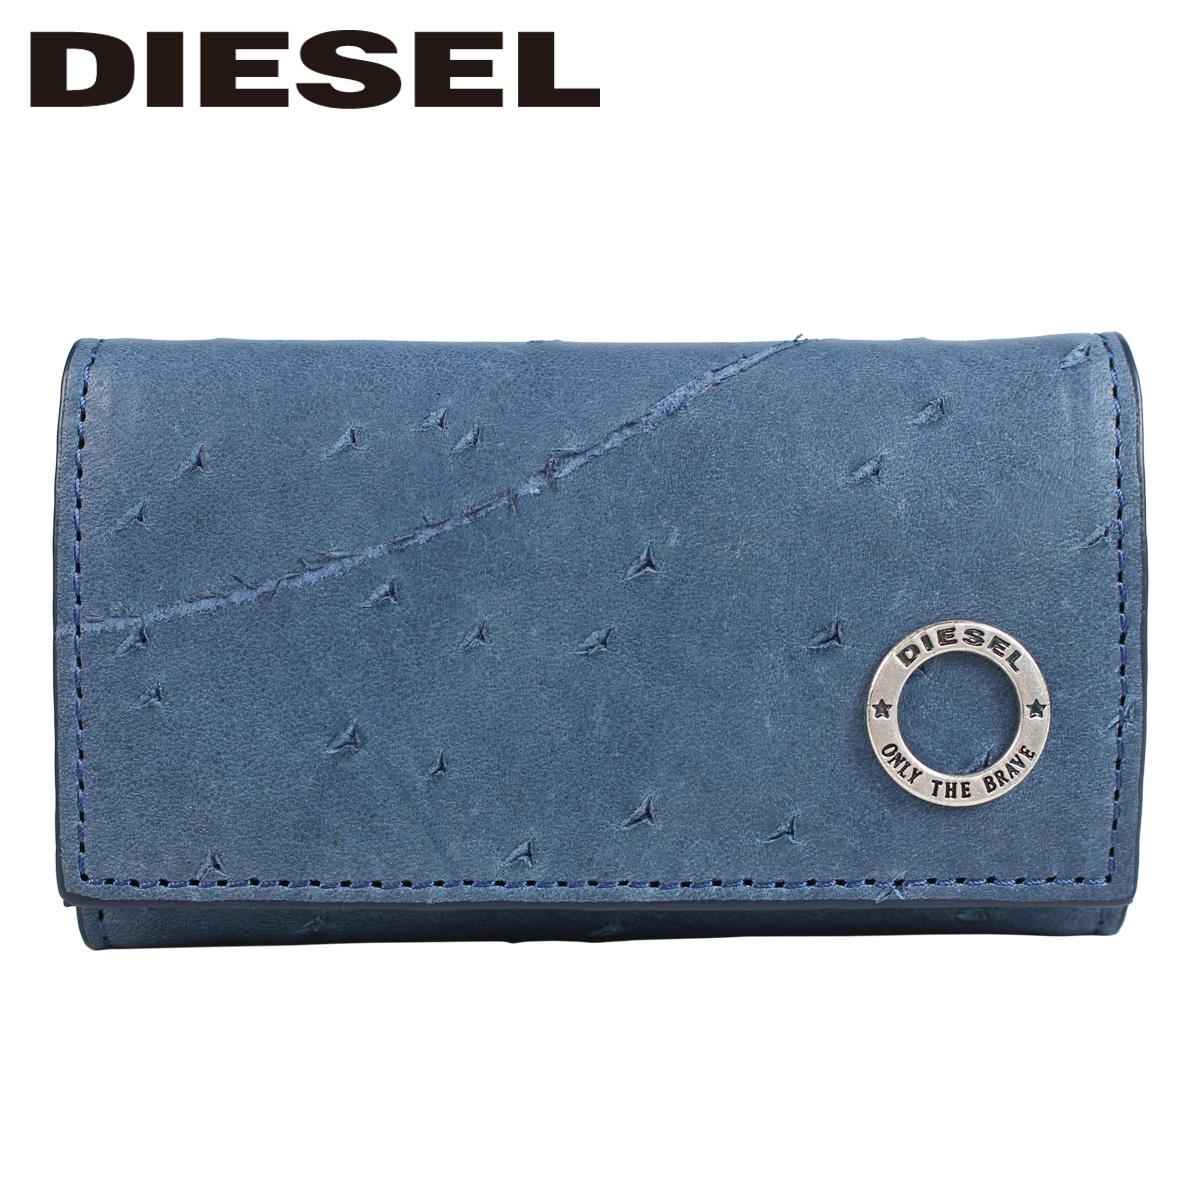 DIESEL ディーゼル キーケース メンズ 本革 6連 KURACAO 24 ZIP ブルー X05825 PR080